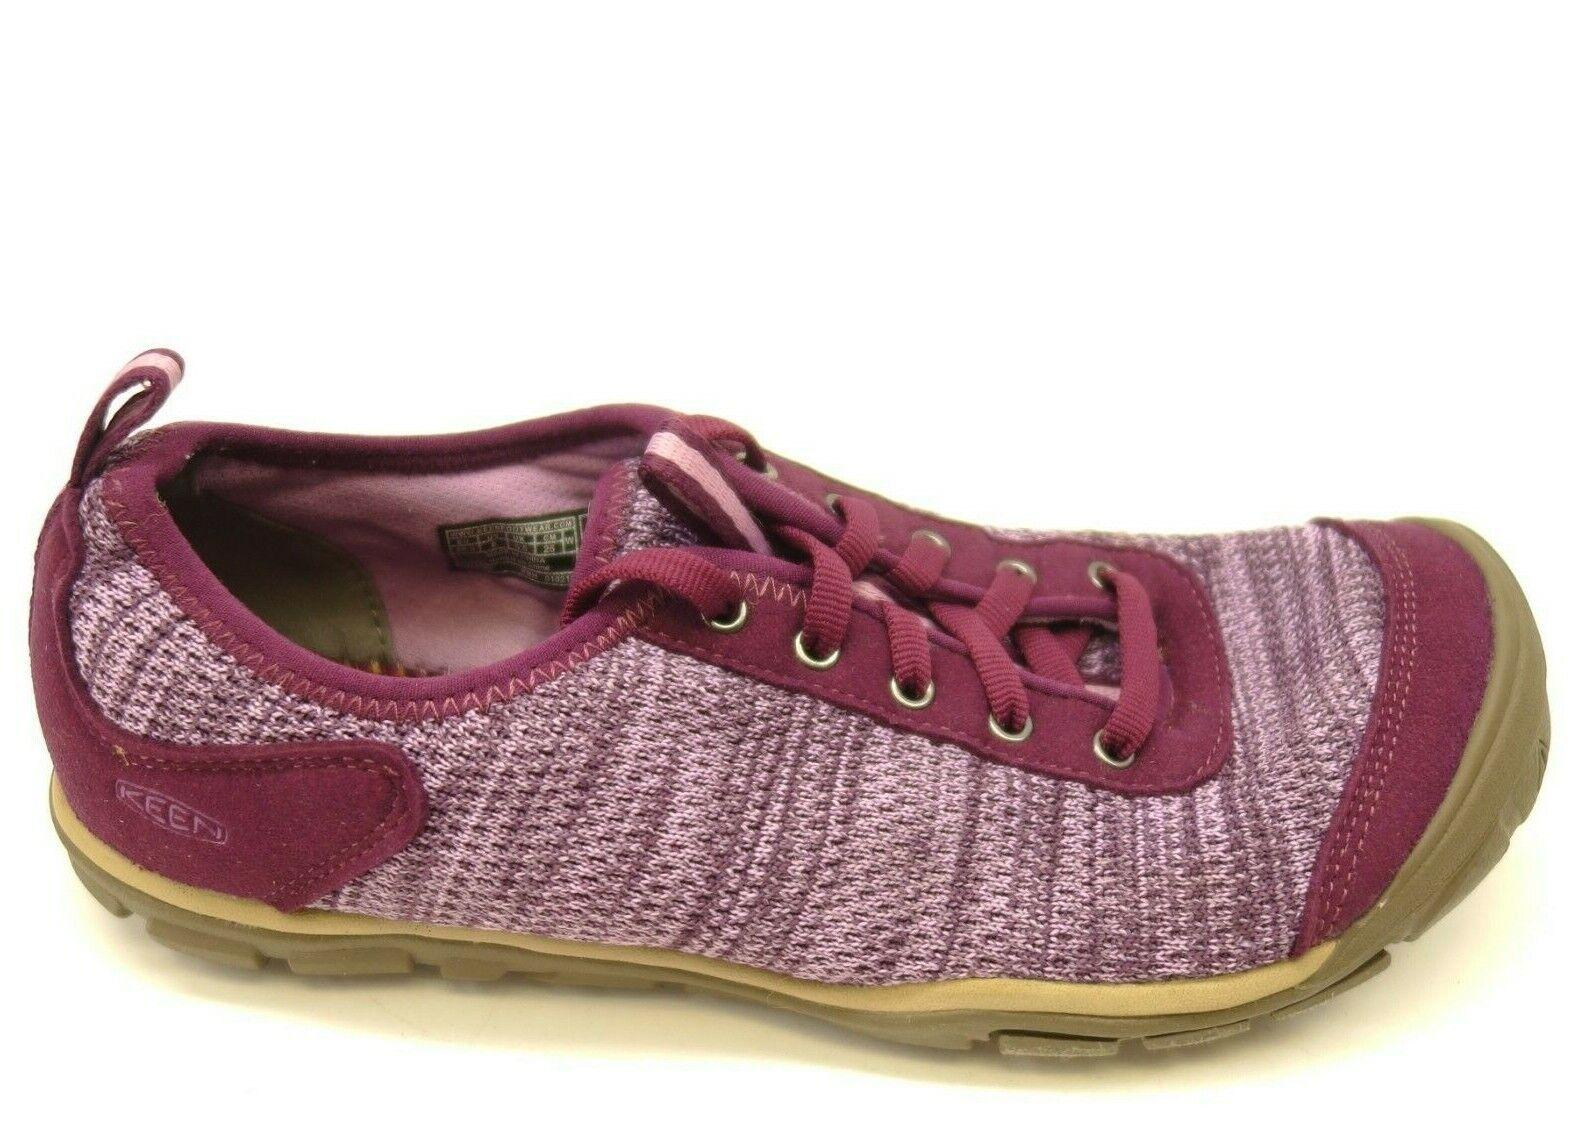 Keen Hush Knit US 8 EU 38.5 Purple Heather Casual Lace shoes Womens Flats